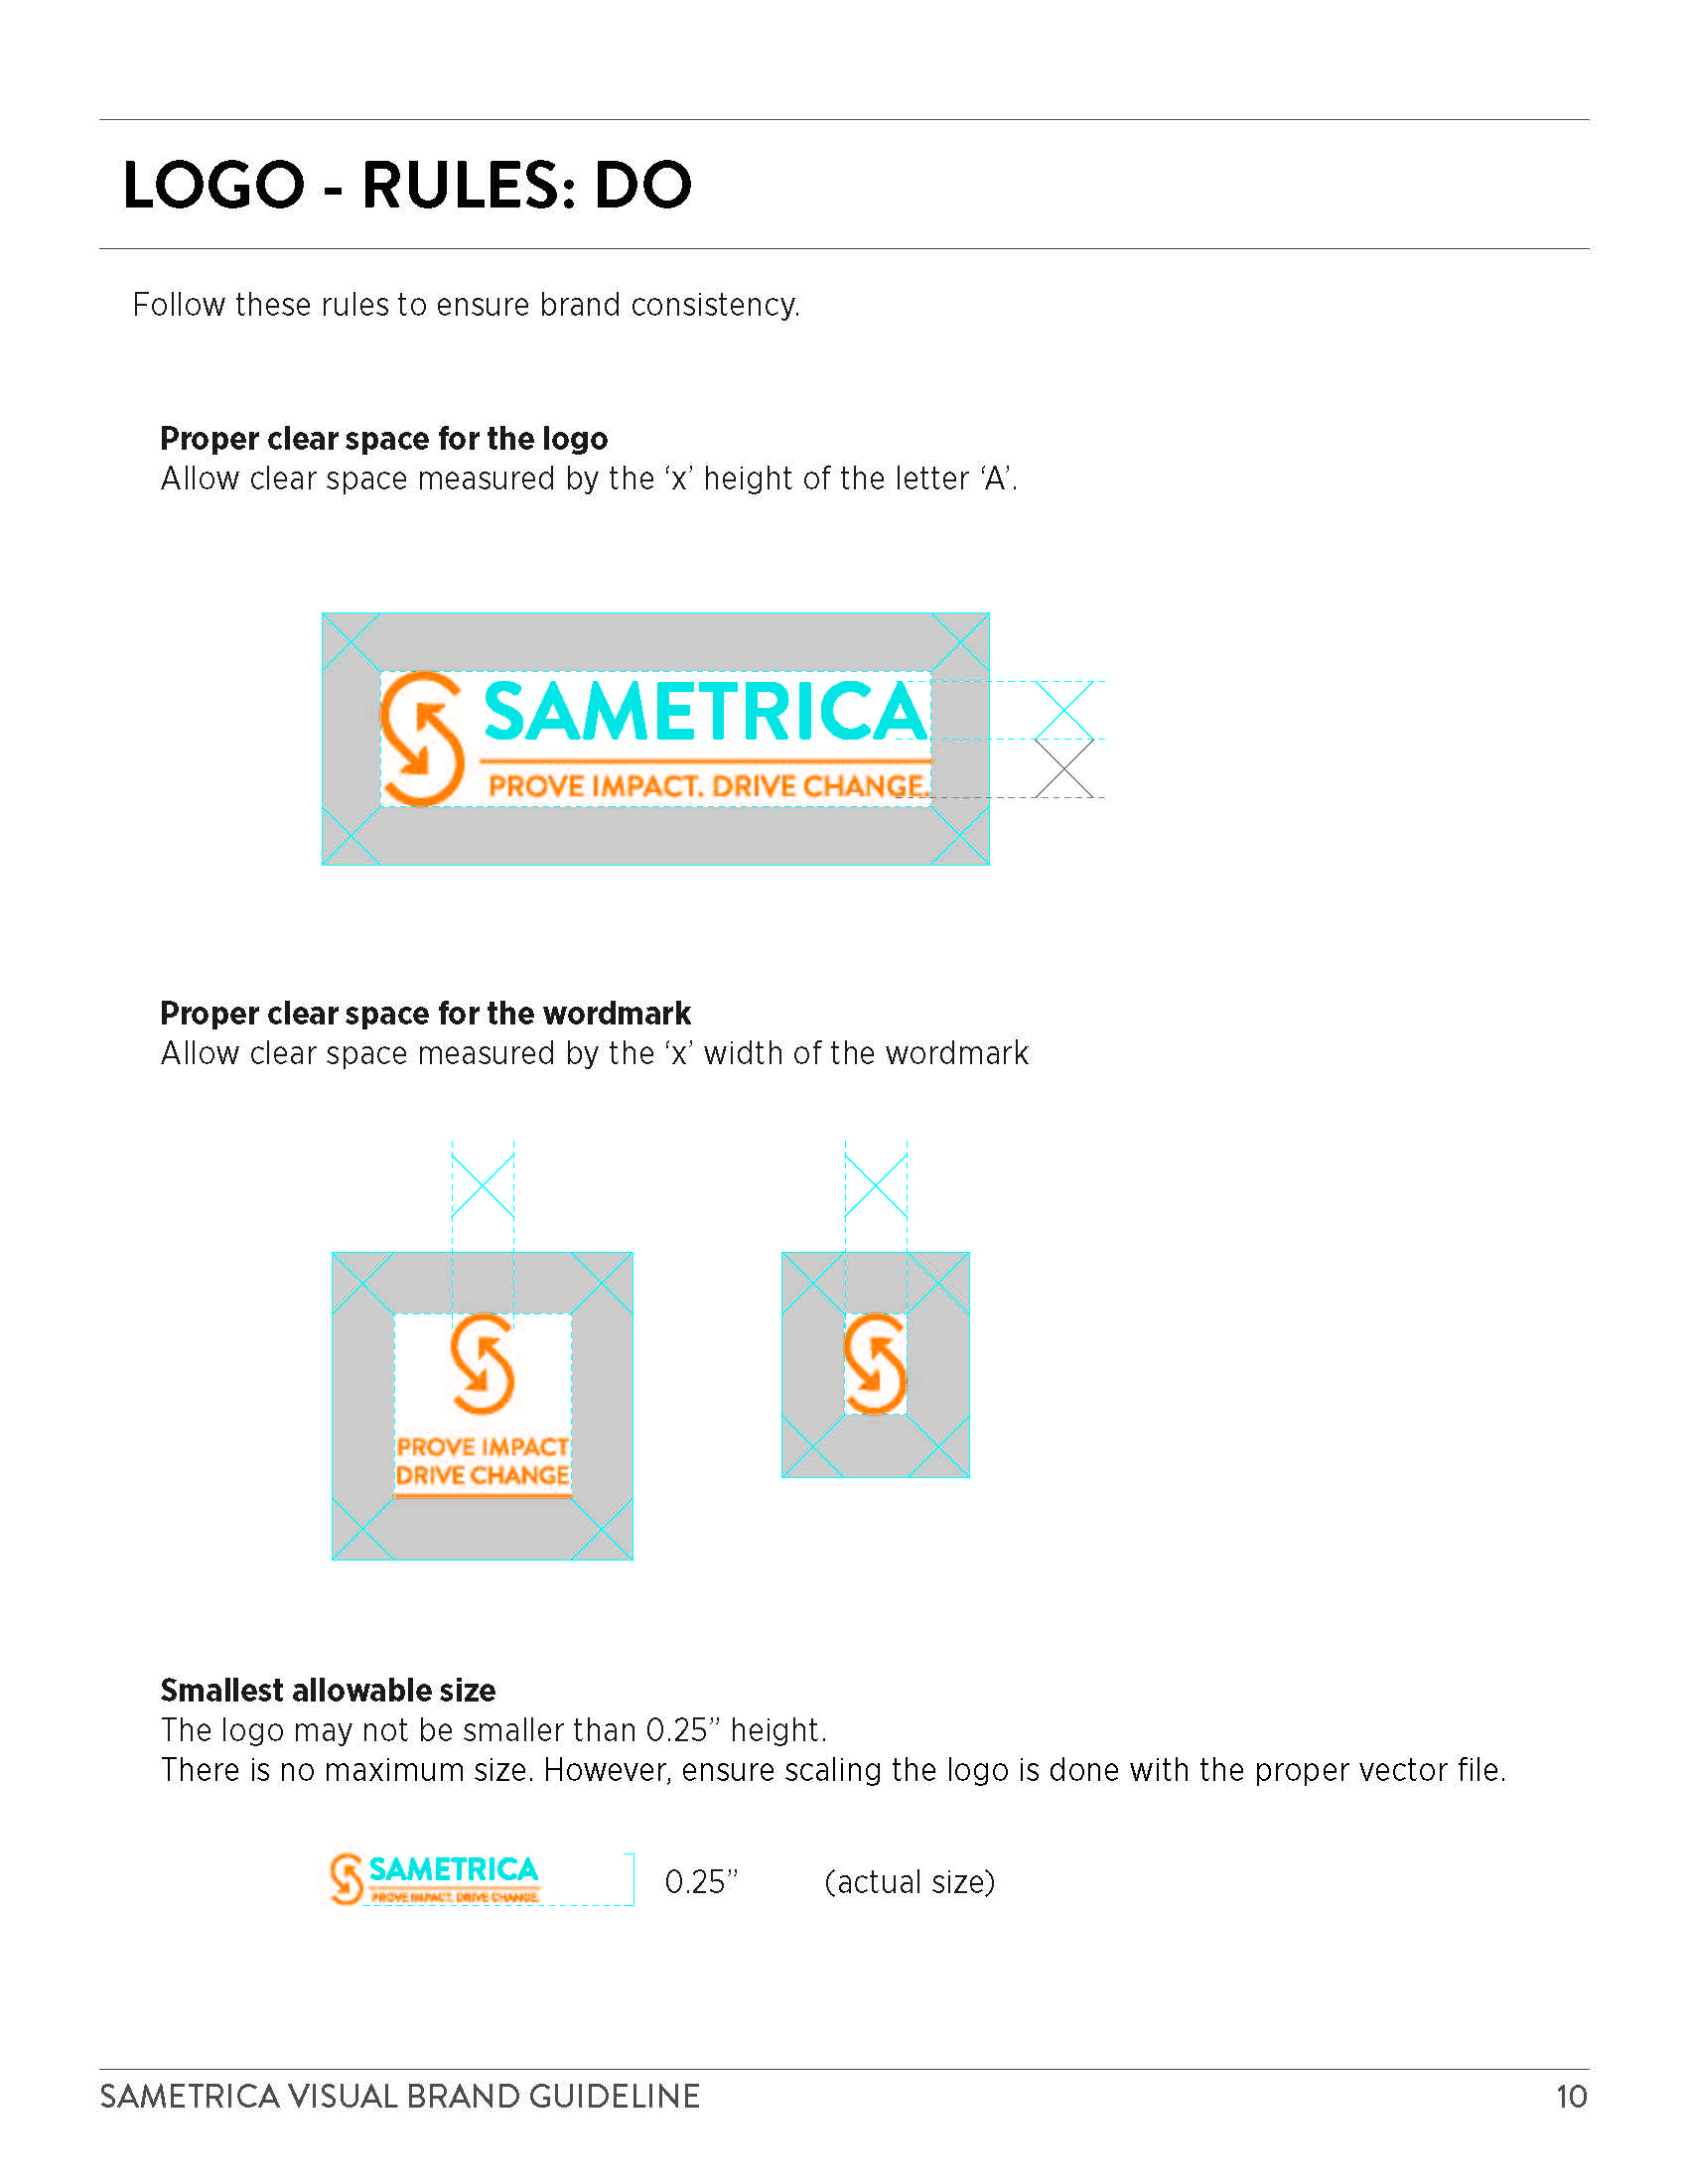 150911_SAMETRICA Brand Guideline_Page_10.jpg